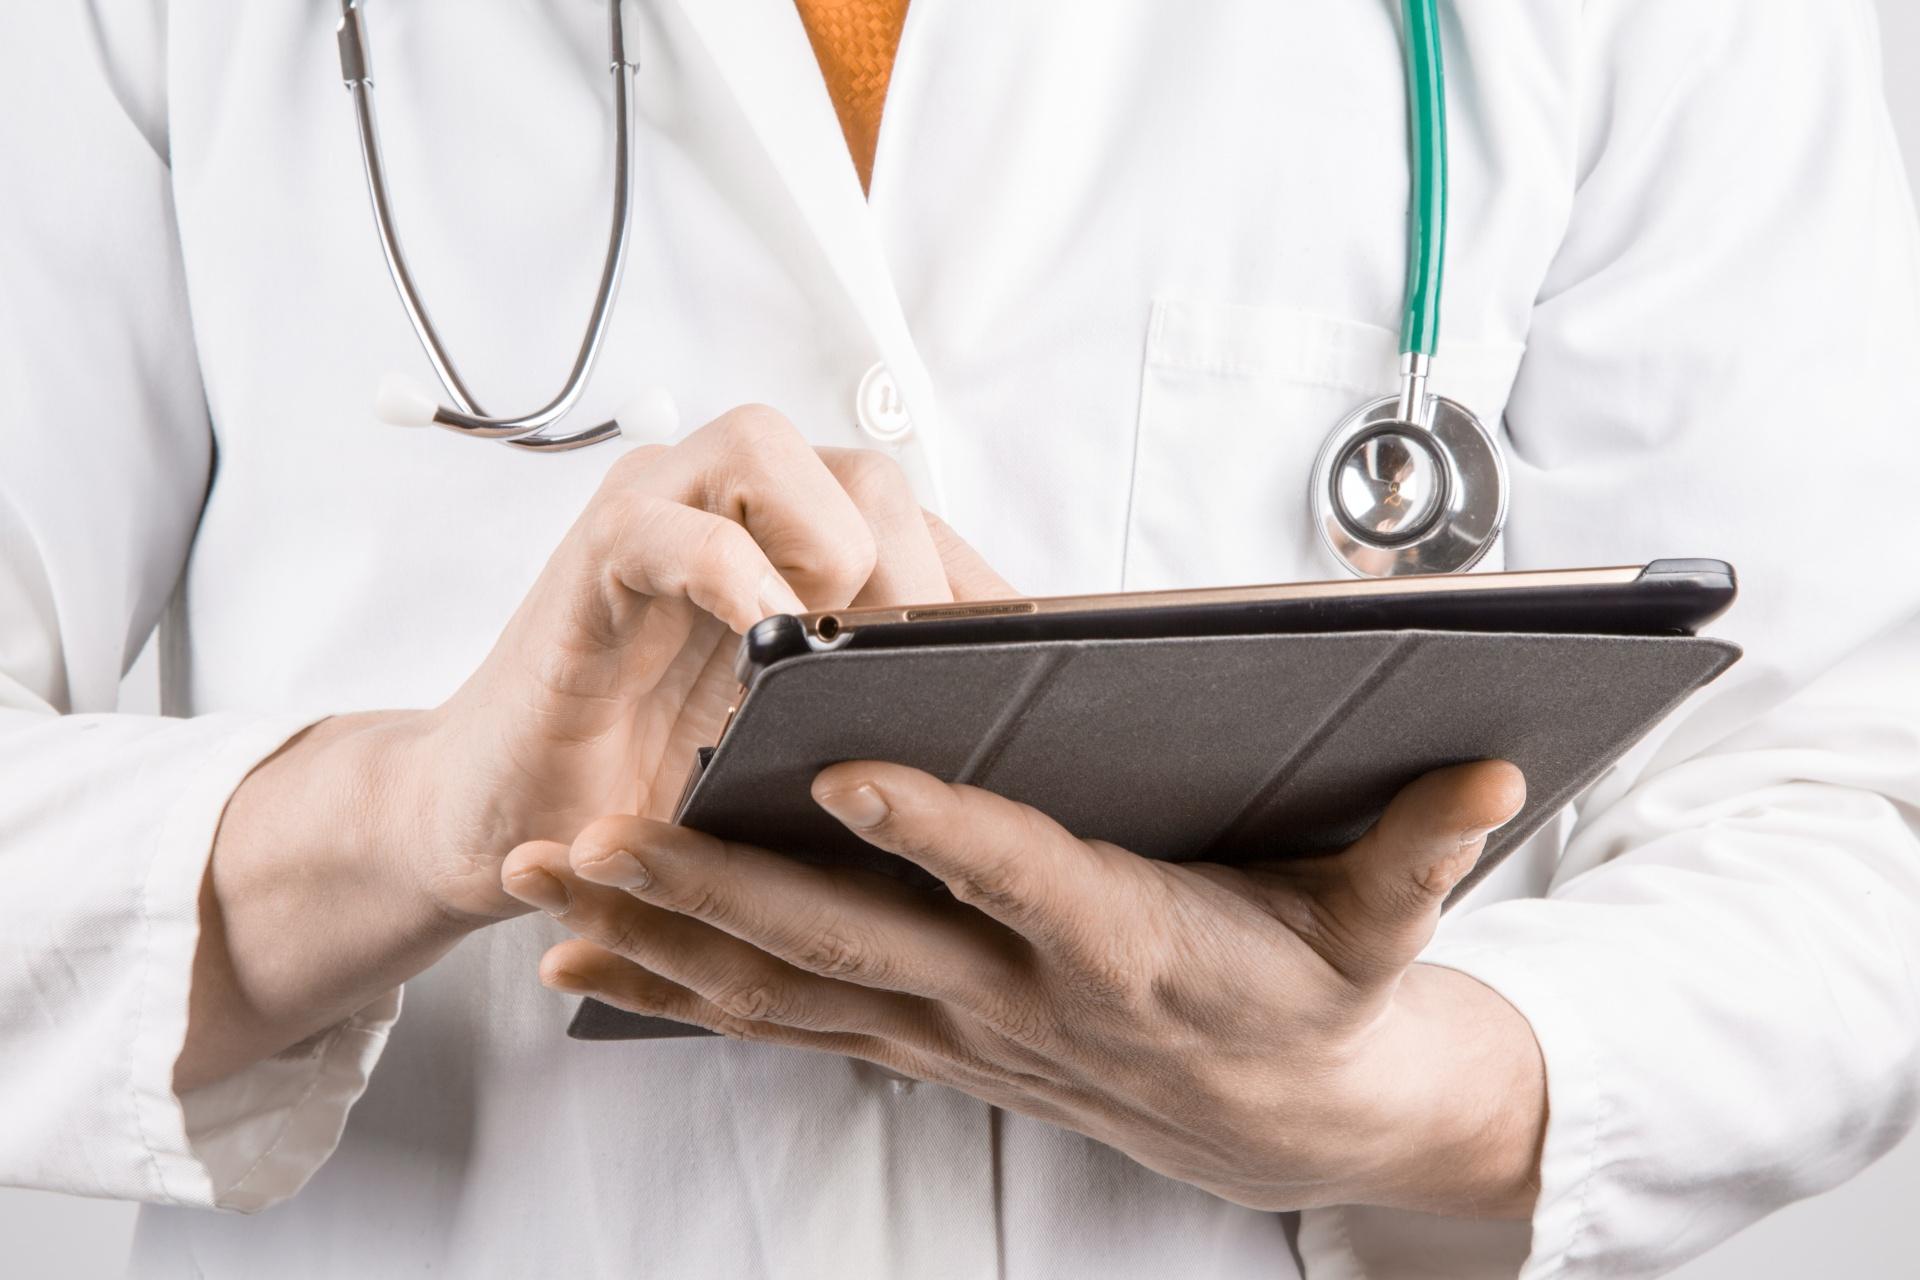 file/ELEMENTO_NEWSLETTER/20083/sanita_doctor-with-tablet.jpg